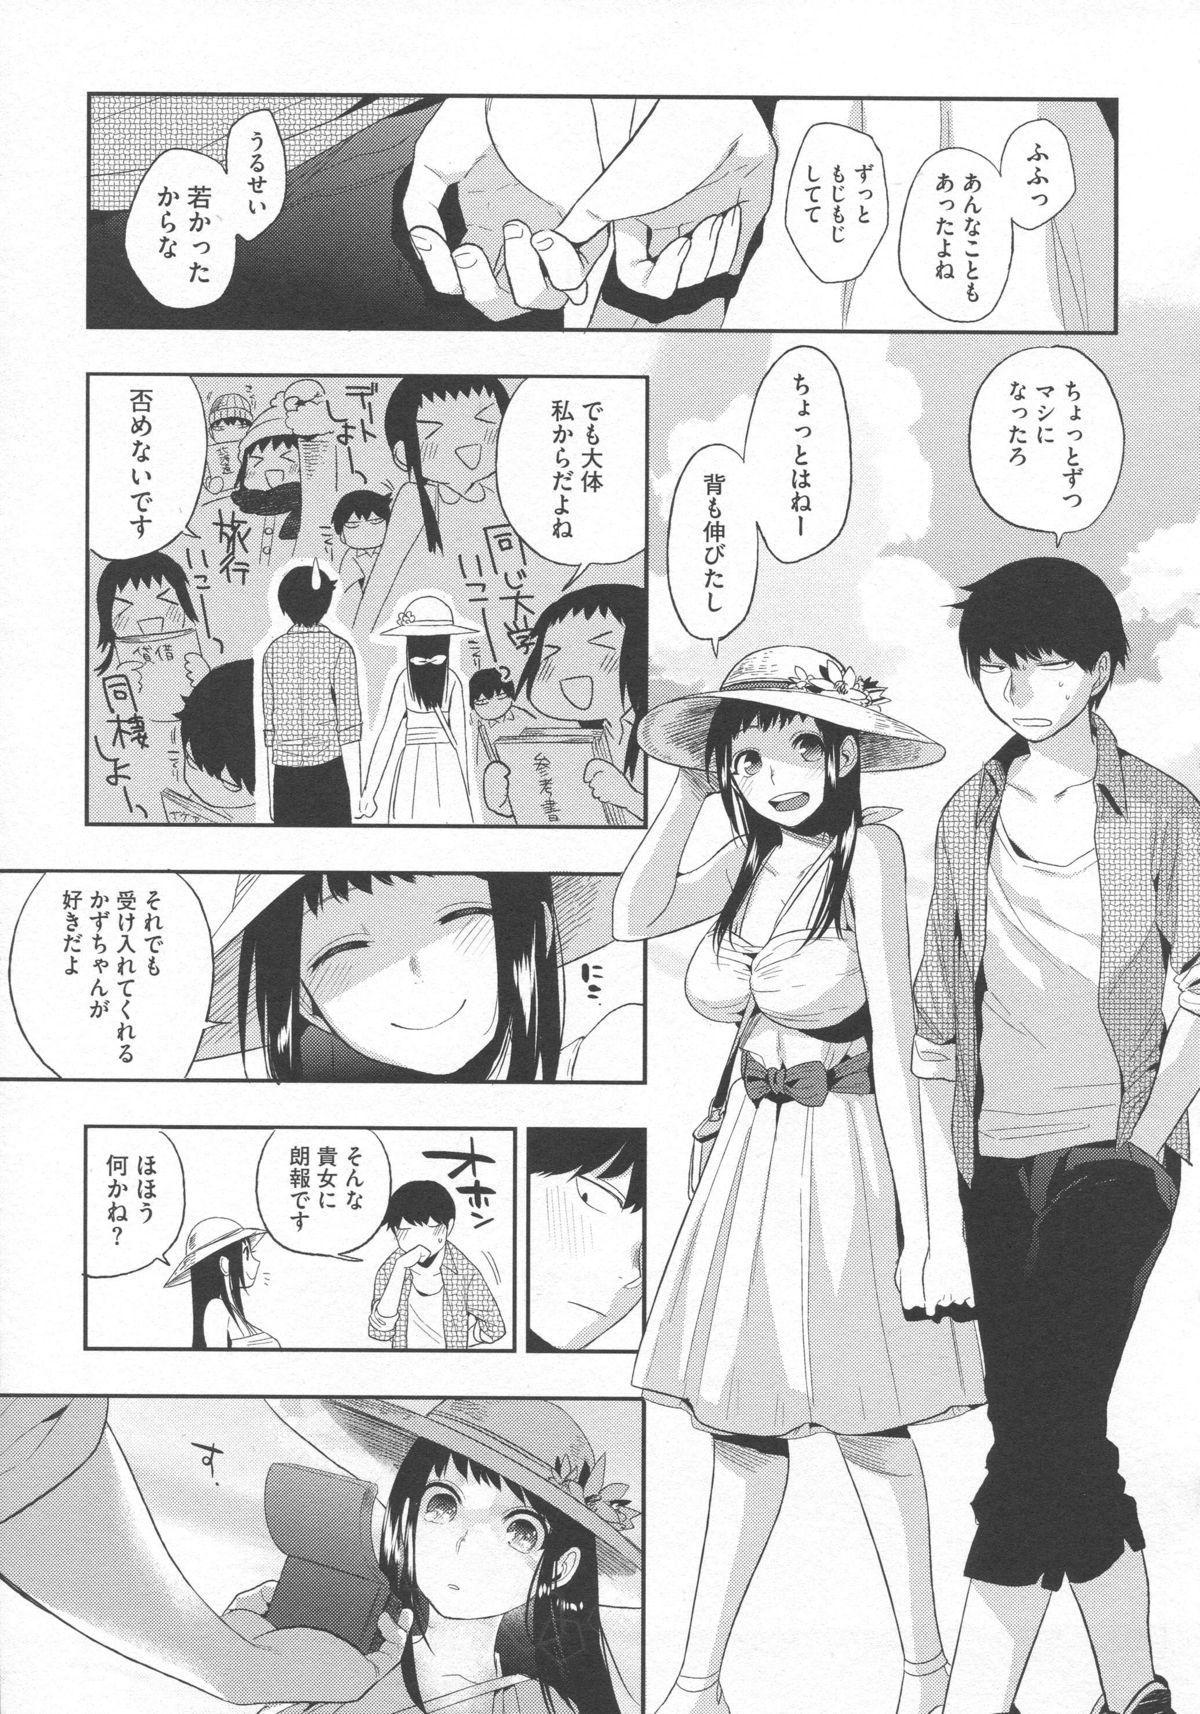 Boku Dake no Yuuyami - Only My Twilight 59